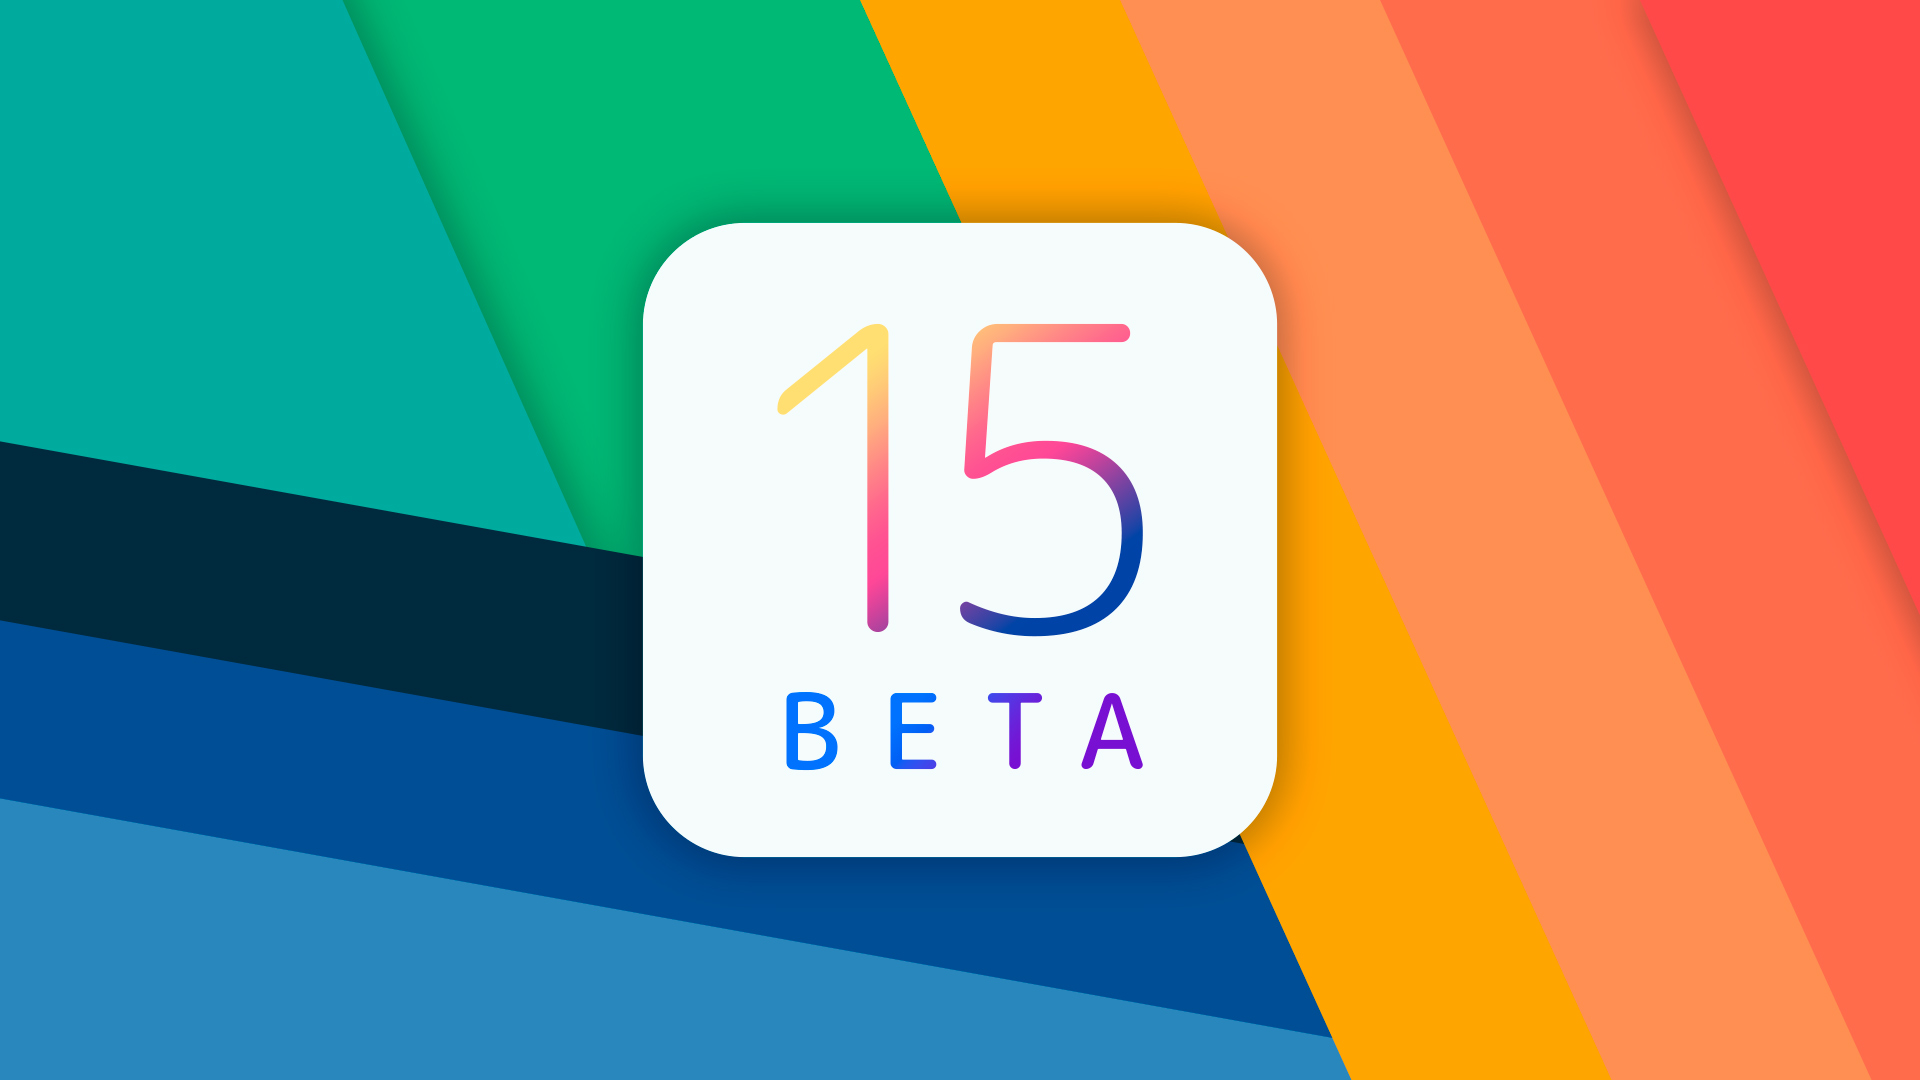 Betriebssystem, Apple, iOS, Beta, iPadOS, Apple iOS, Apple iPadOS, iOS Update, iOS 15, 15, iPadOS 15, iOS 15 Beta, 15 Beta